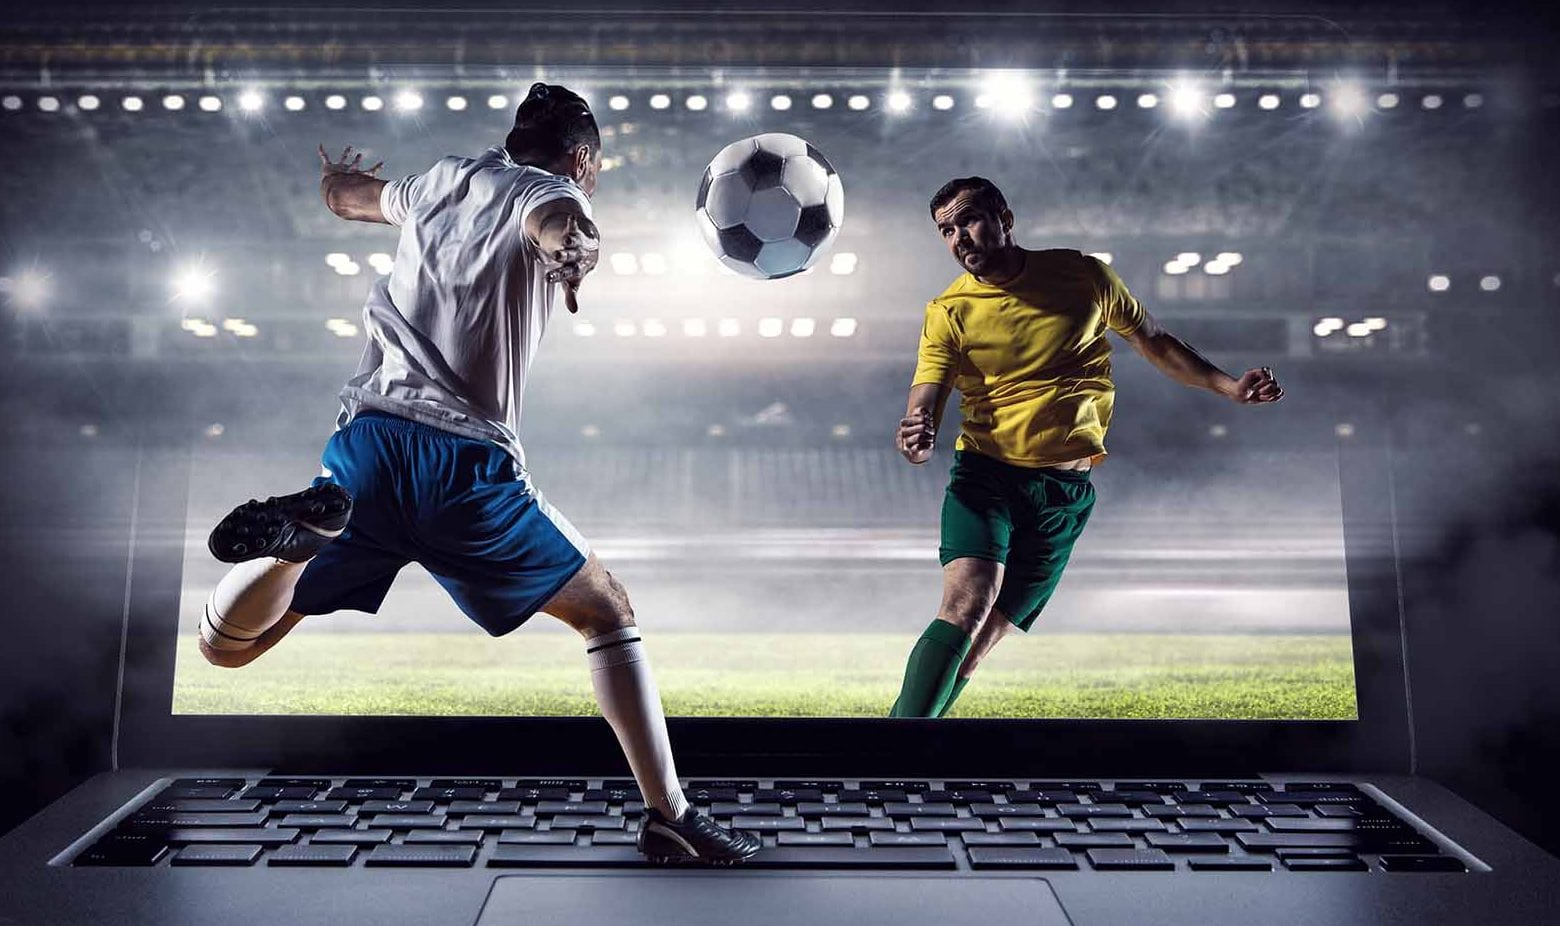 Ставки на спорт: сколько можно заработать новичку, Фото № 1 - 1-consult.net